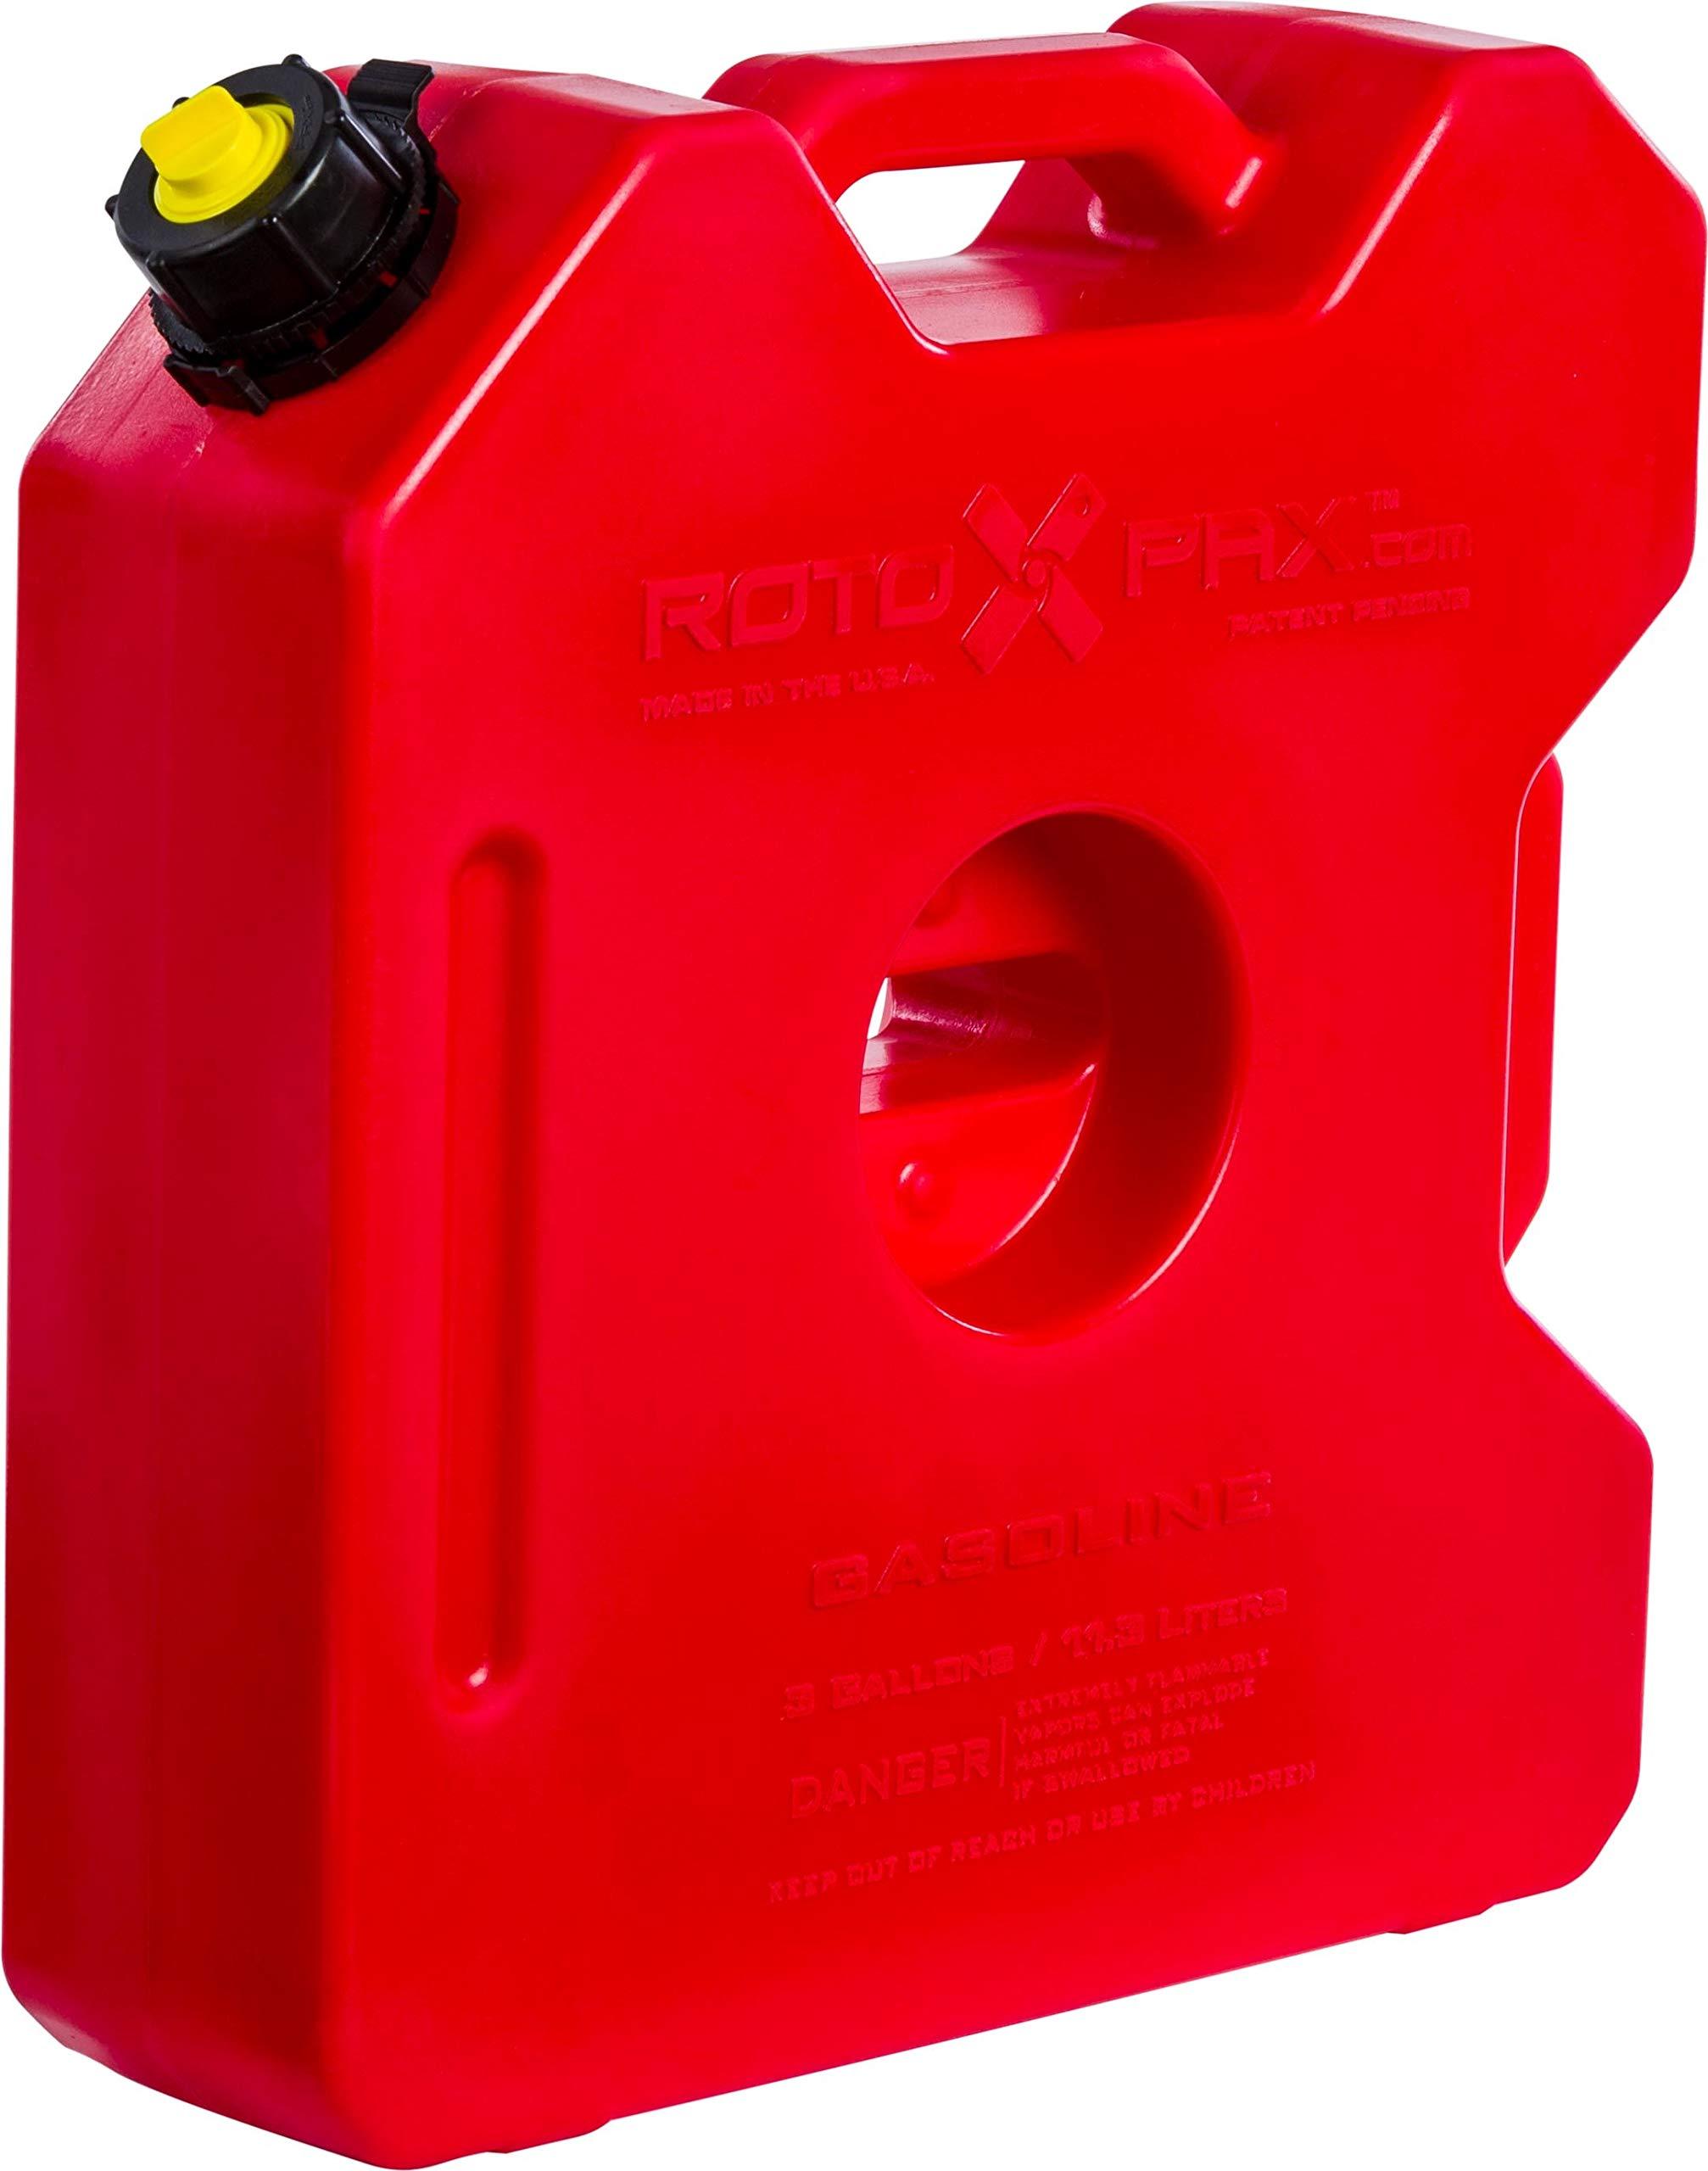 RotopaX RX-3G Gasoline Pack - 3 Gallon Capacity